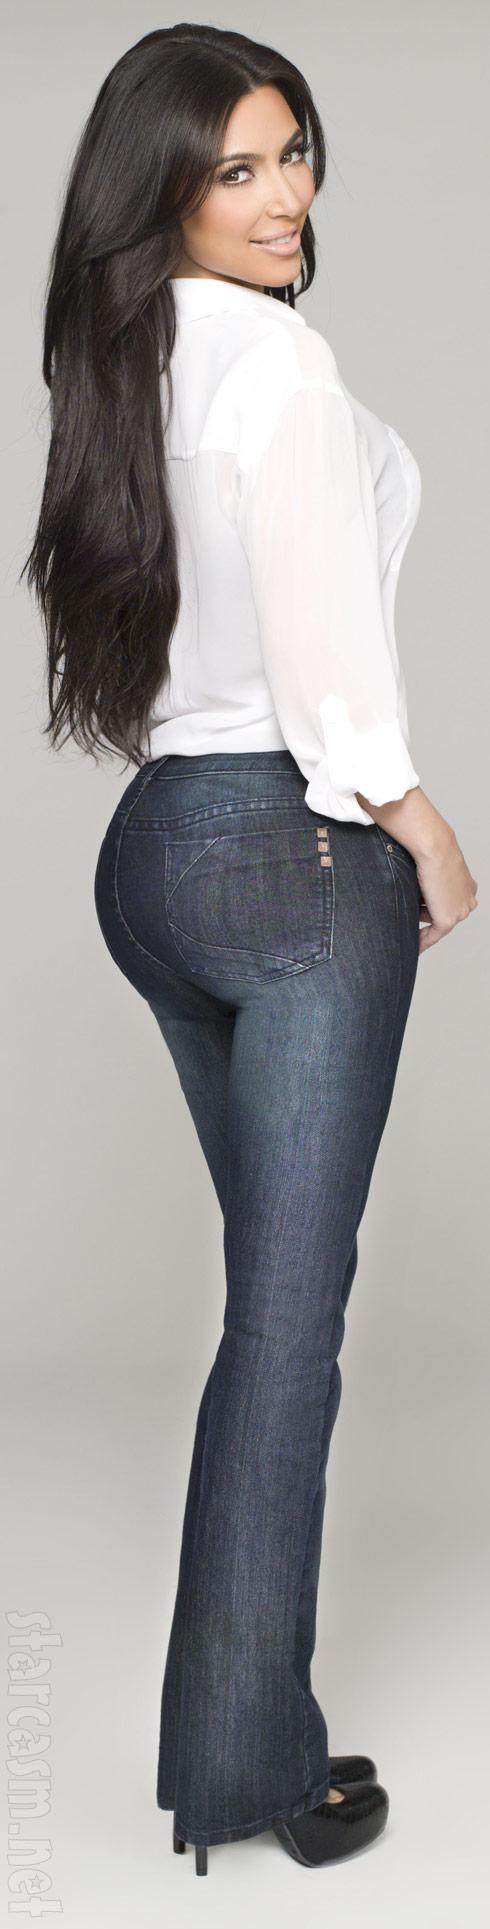 Kim Kardashian's big booty in jeans